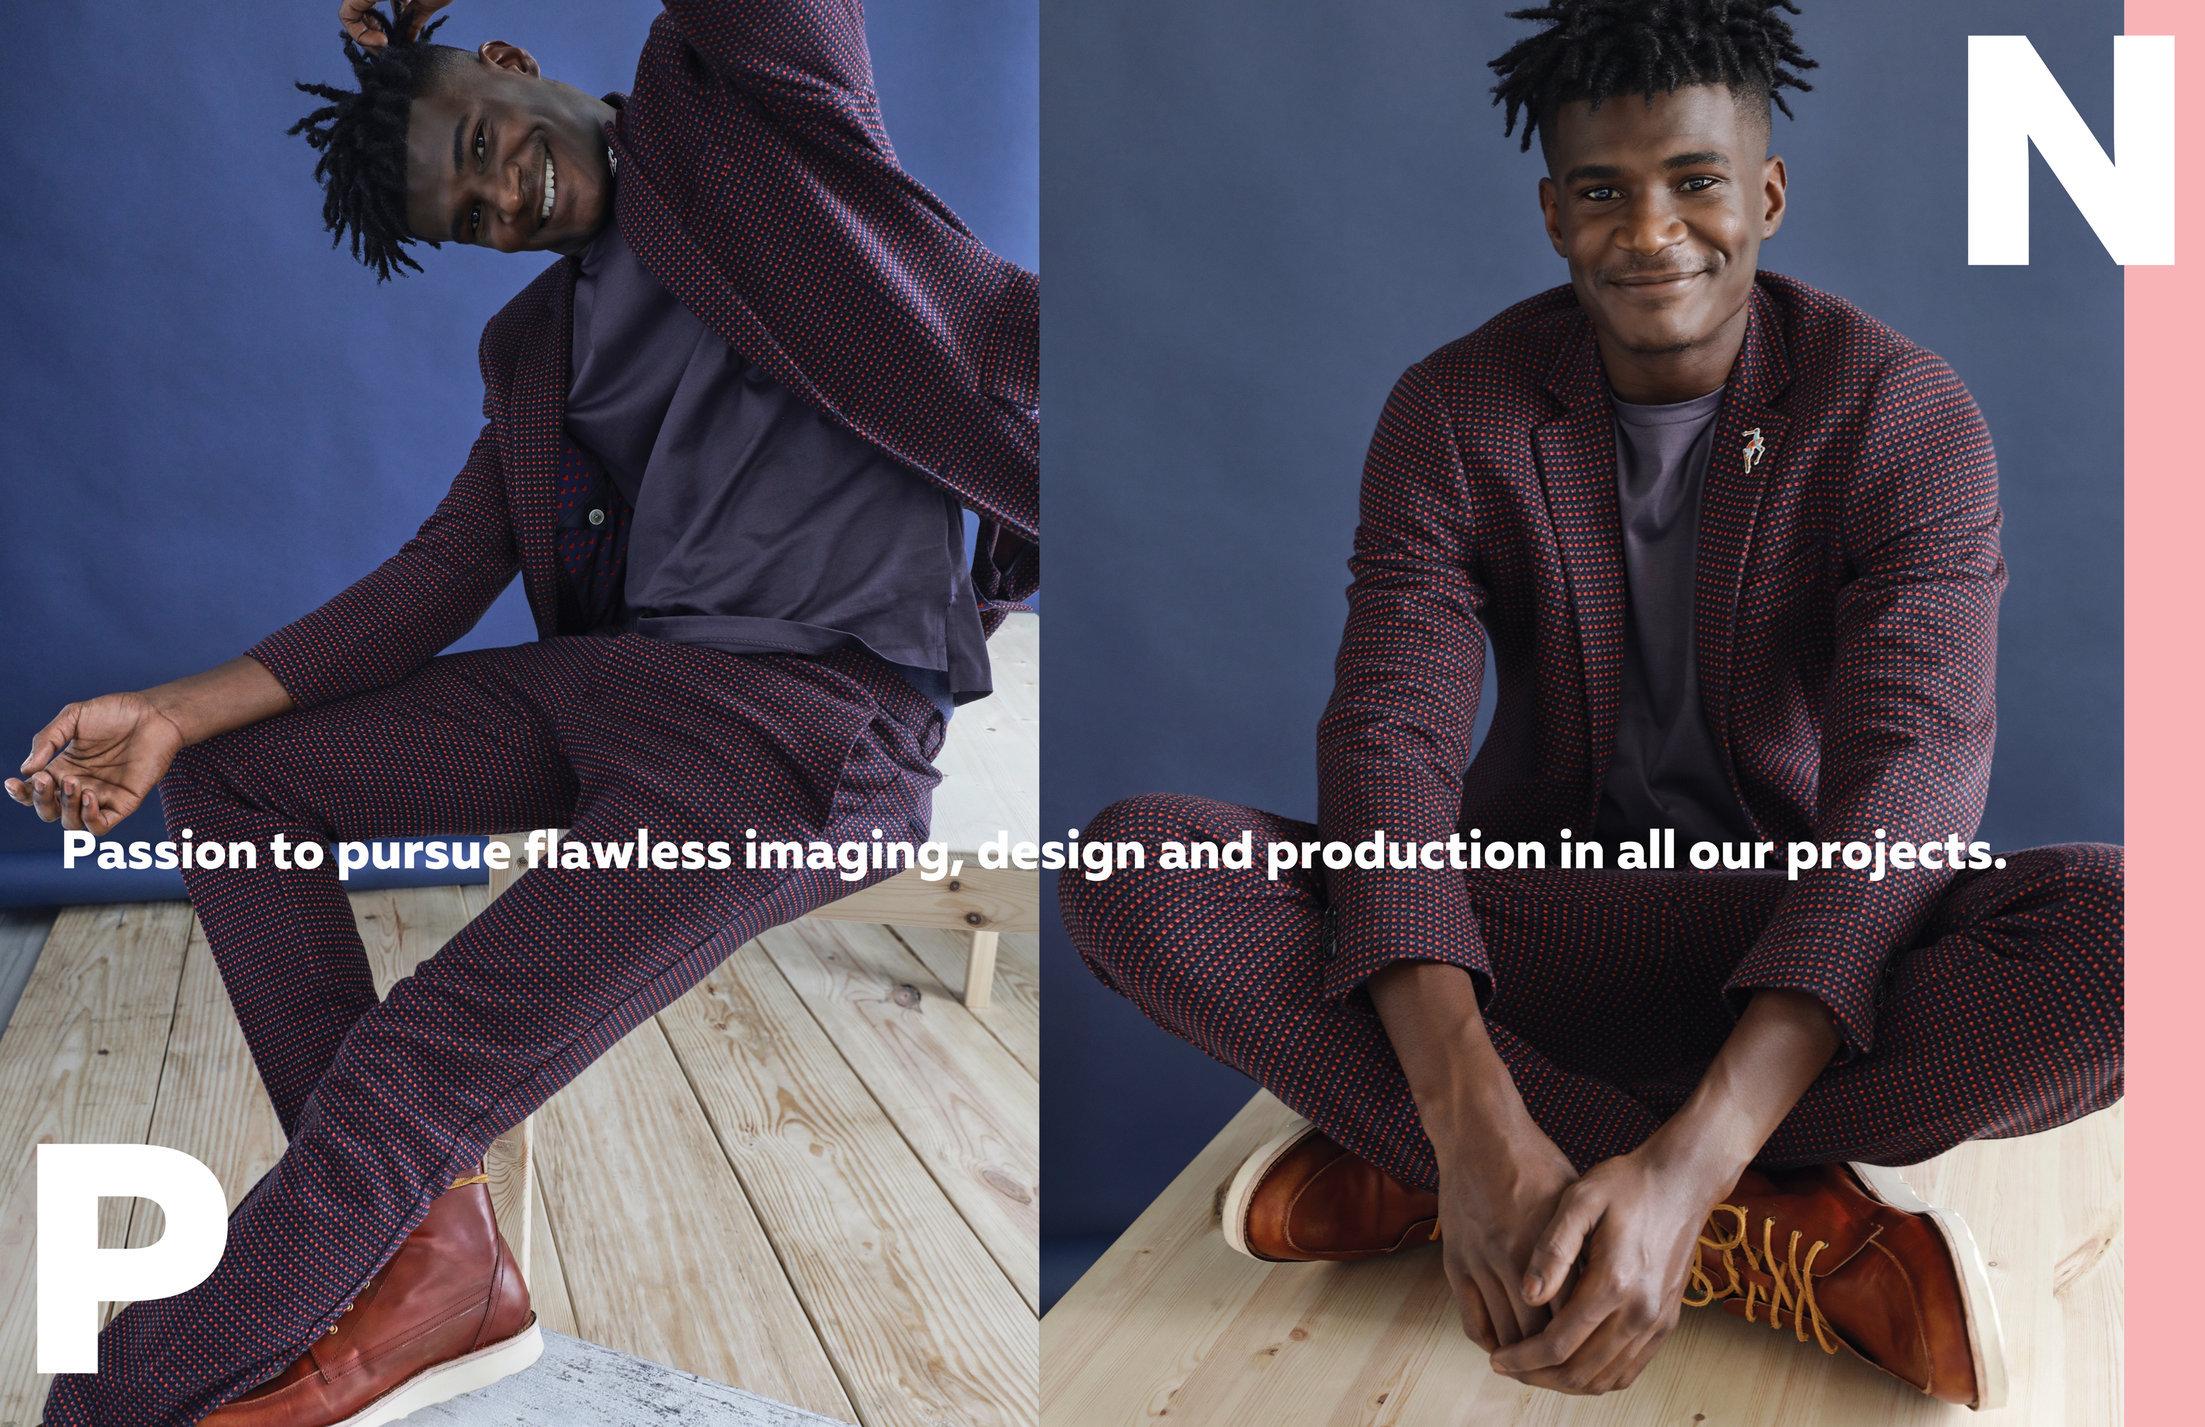 trevor-front-model-fashion-photographer-nico-stipcianos-miami-copy-19.jpg